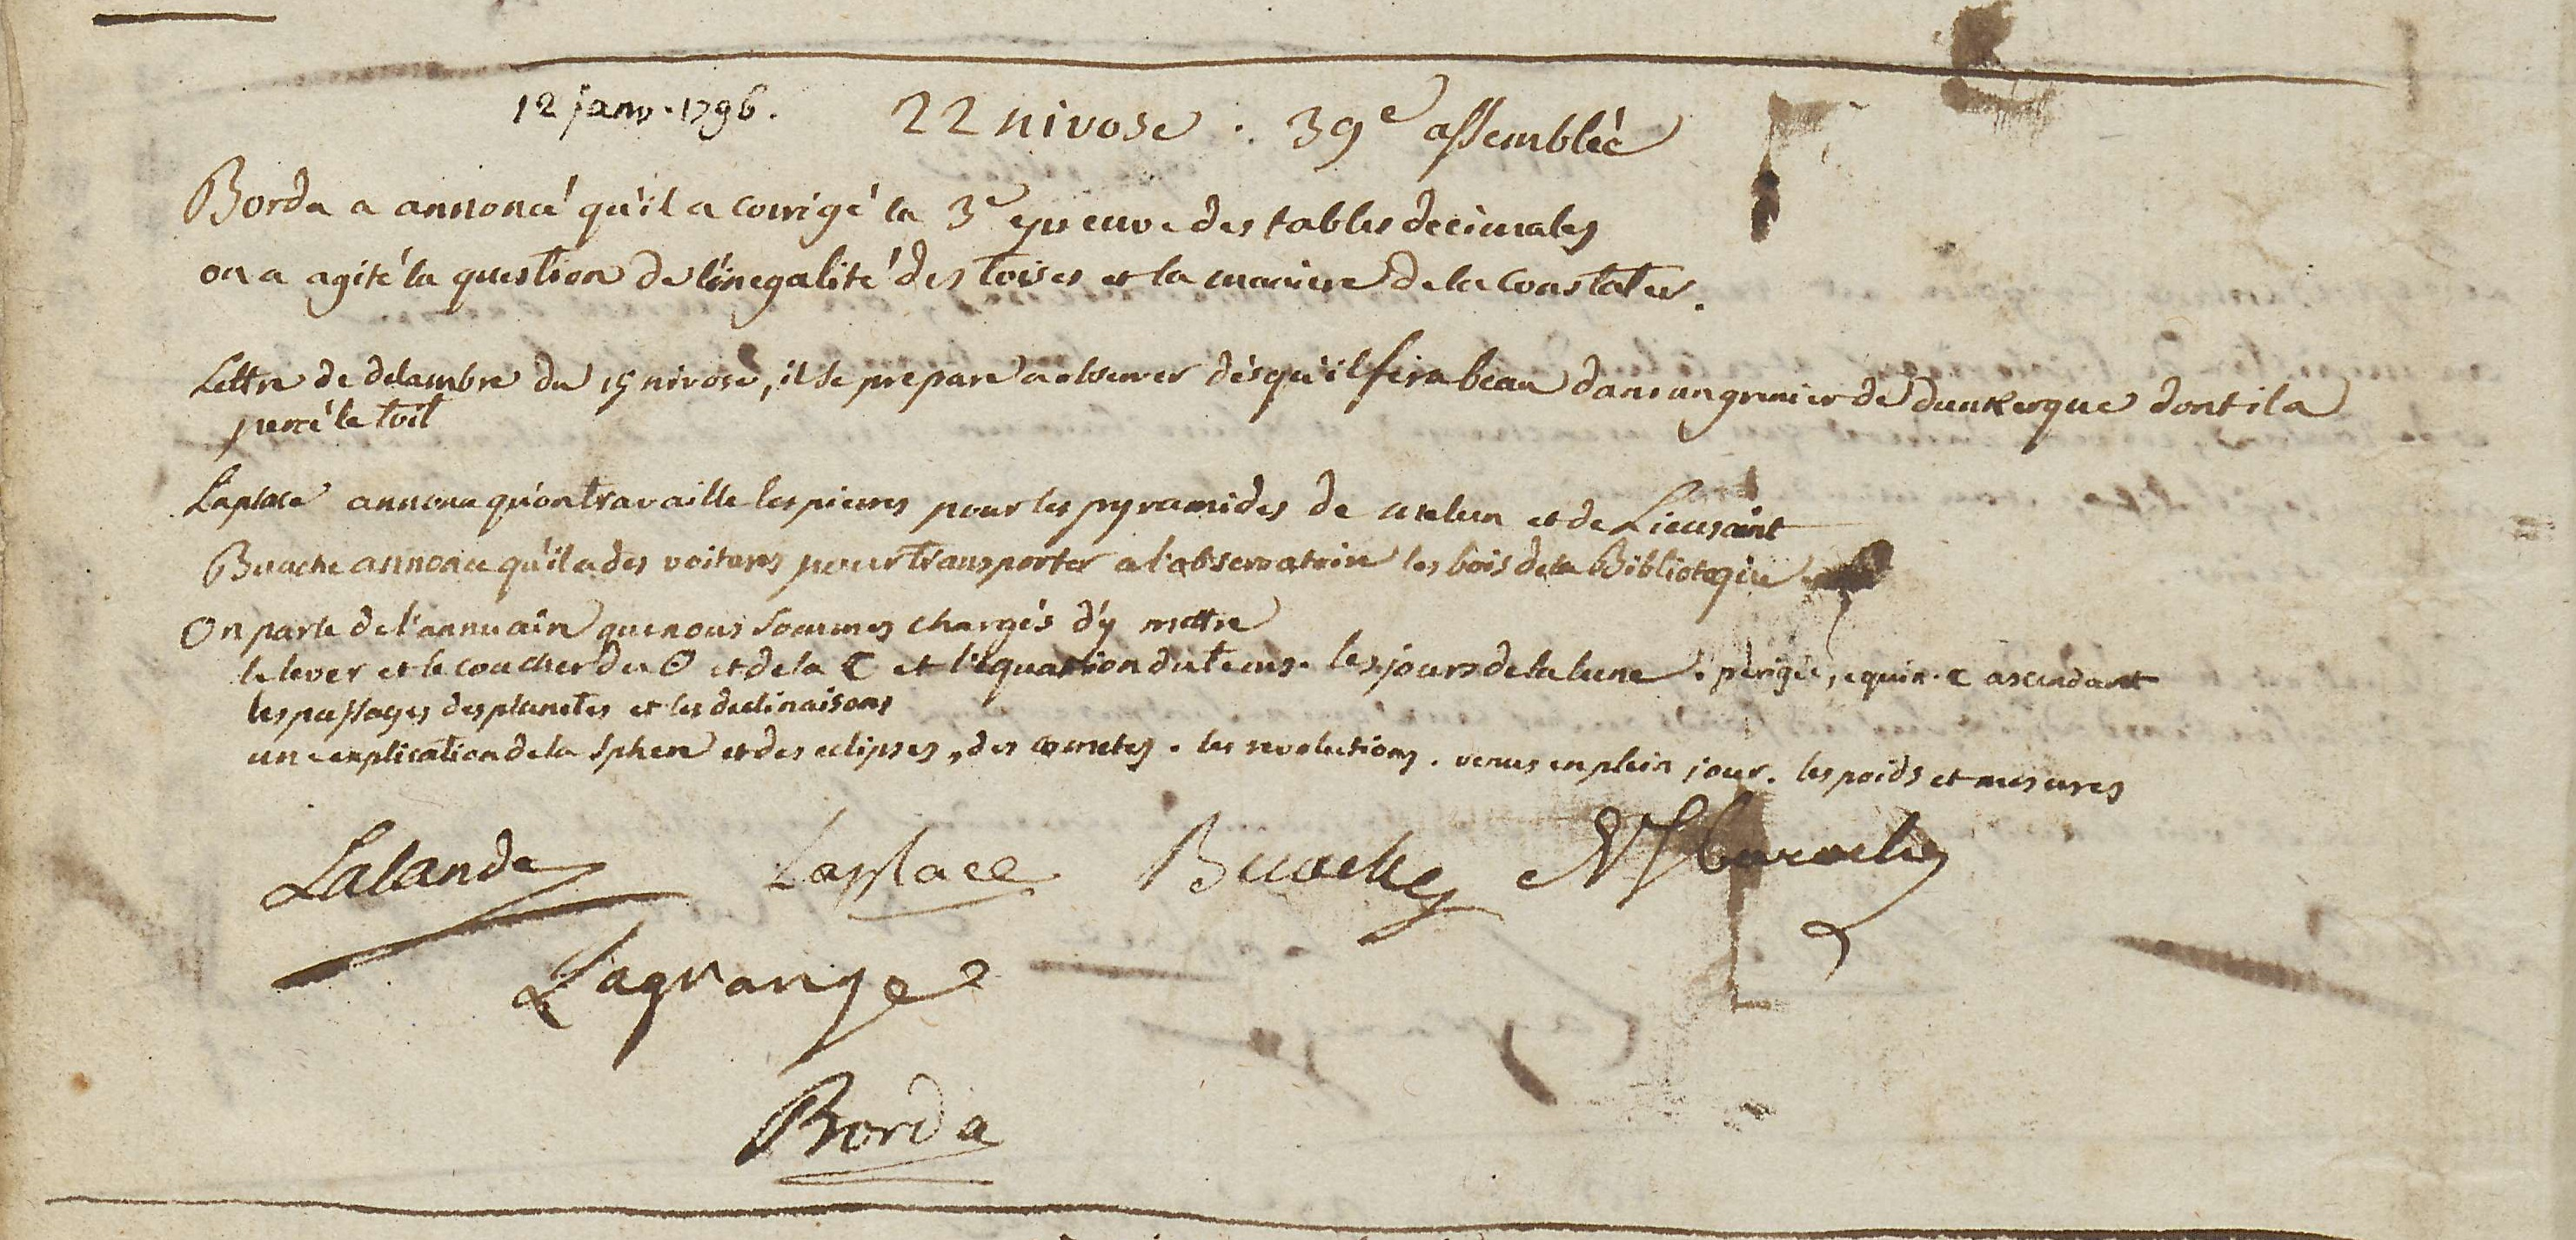 Procès-verbal du 12 janvier 1796